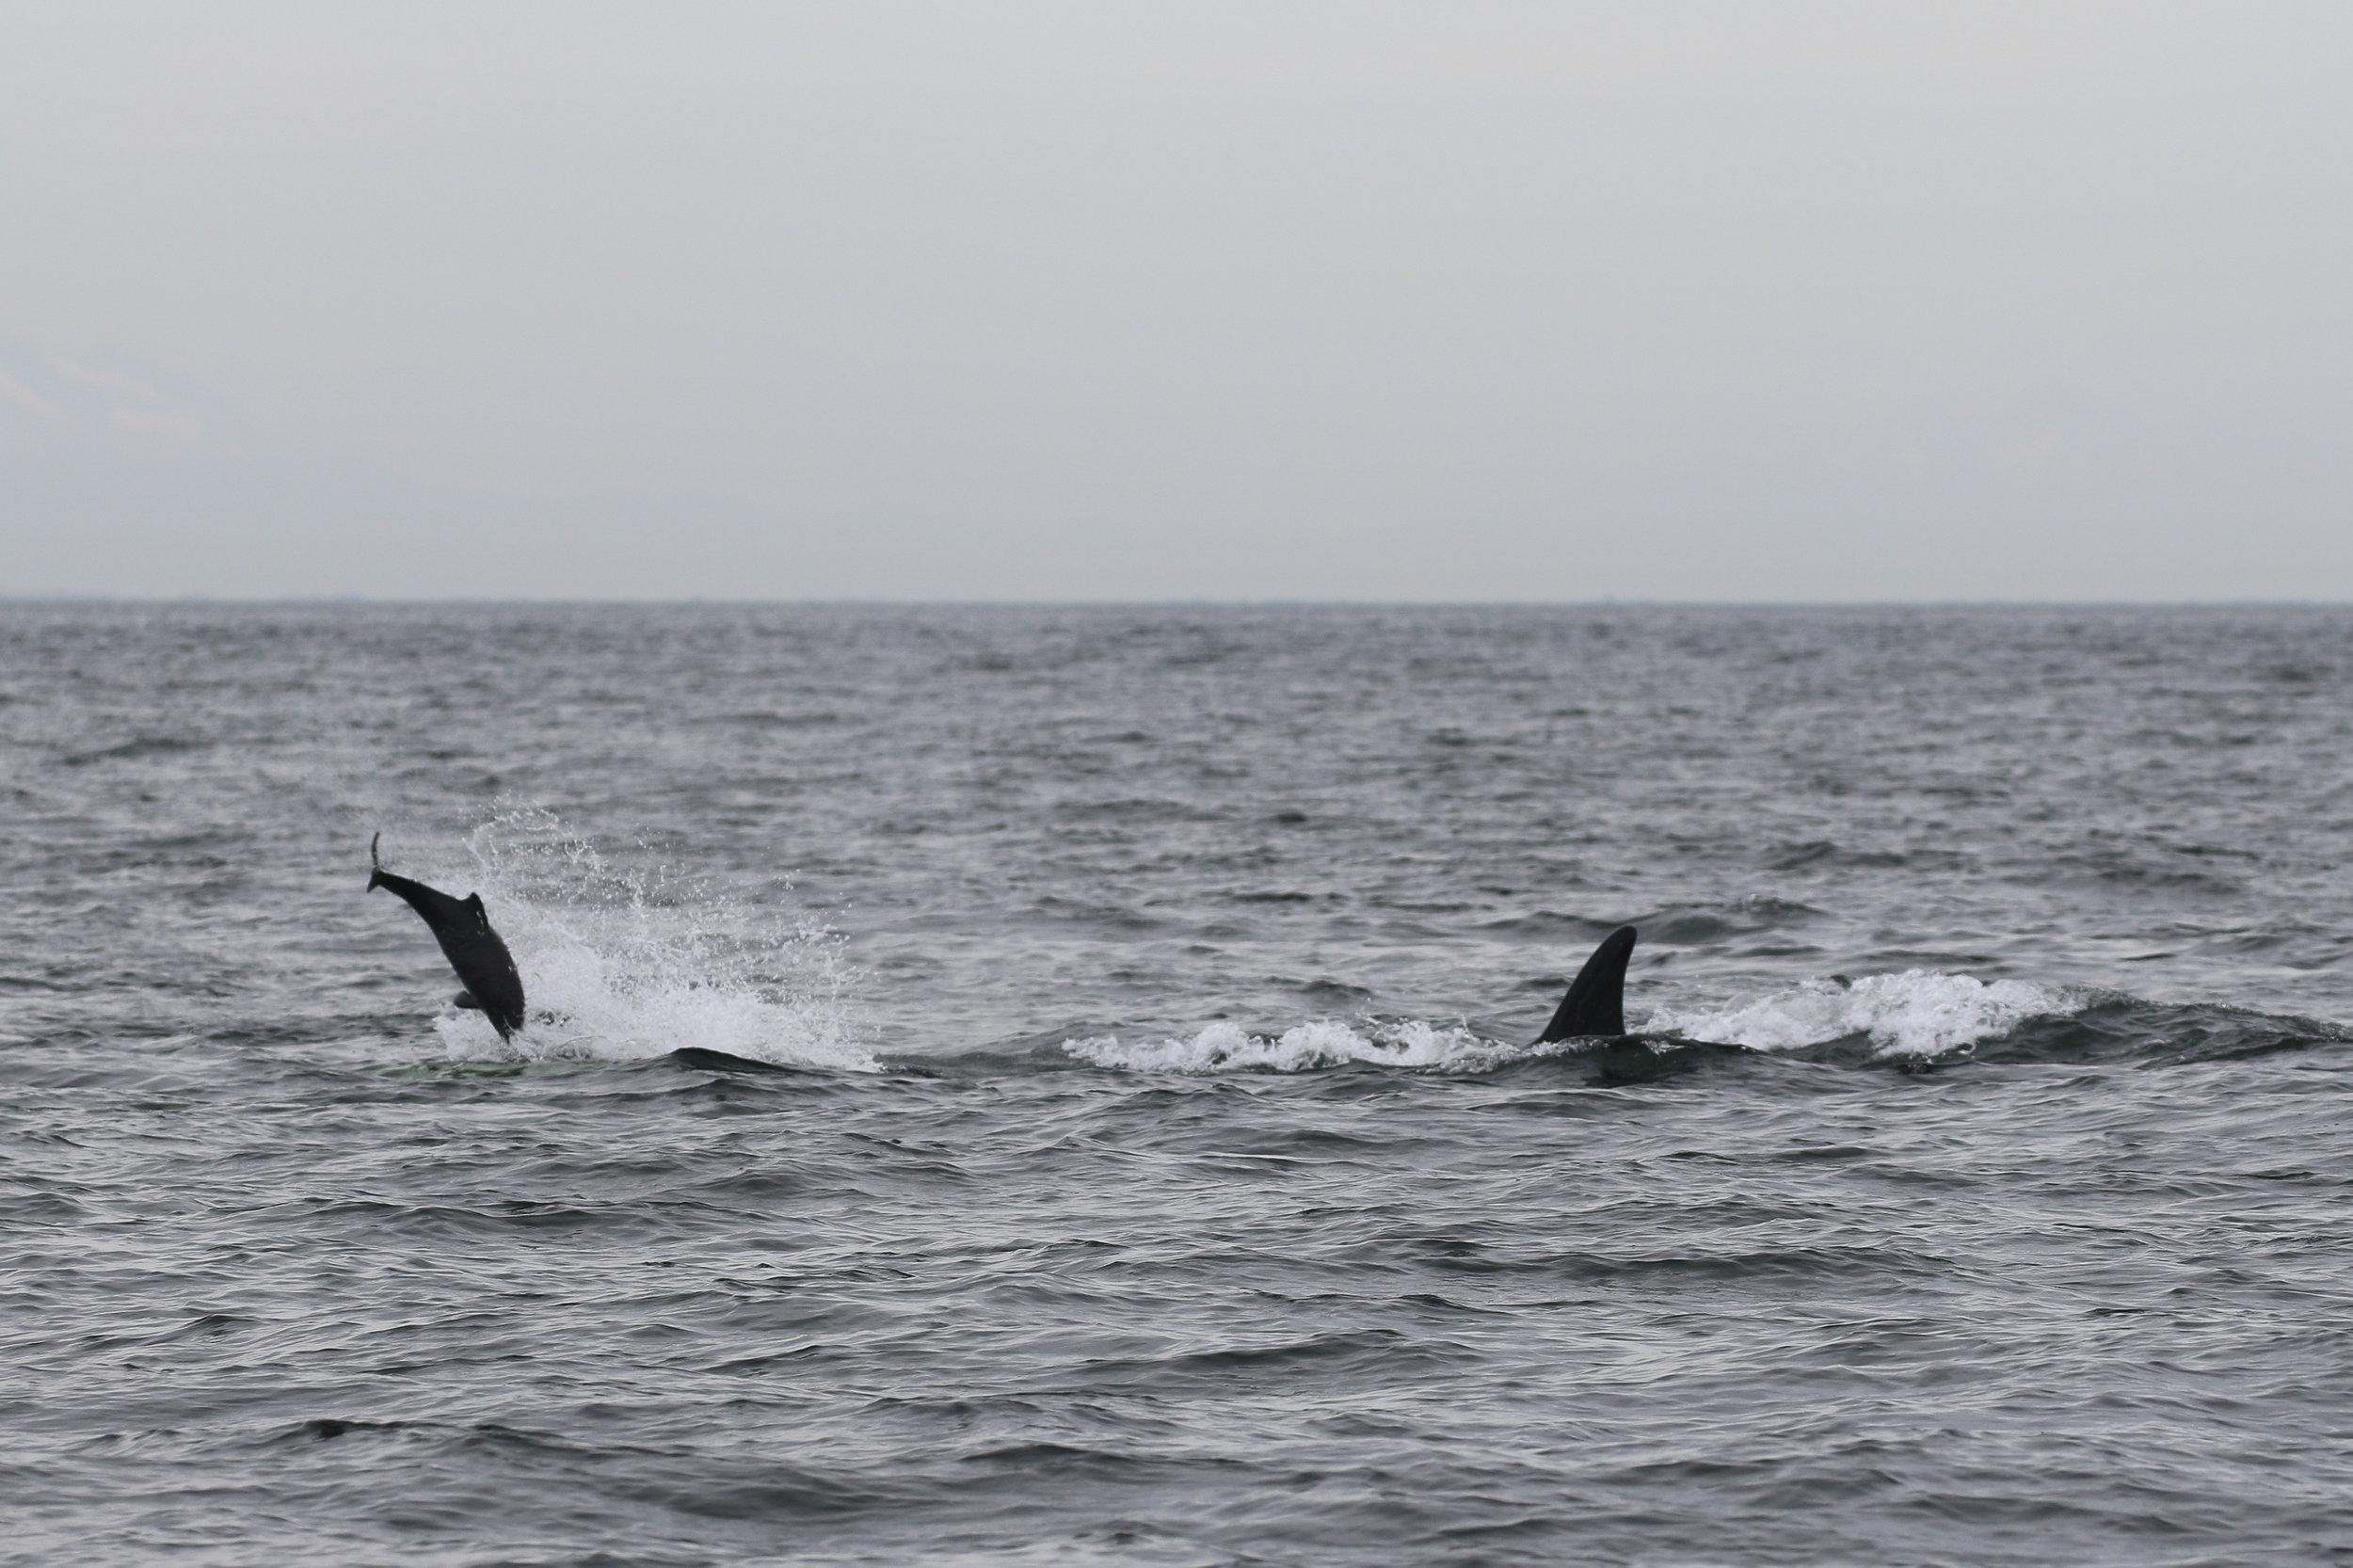 Harbour porpoise being tossed around! Photo by Rodrigo (3:30)